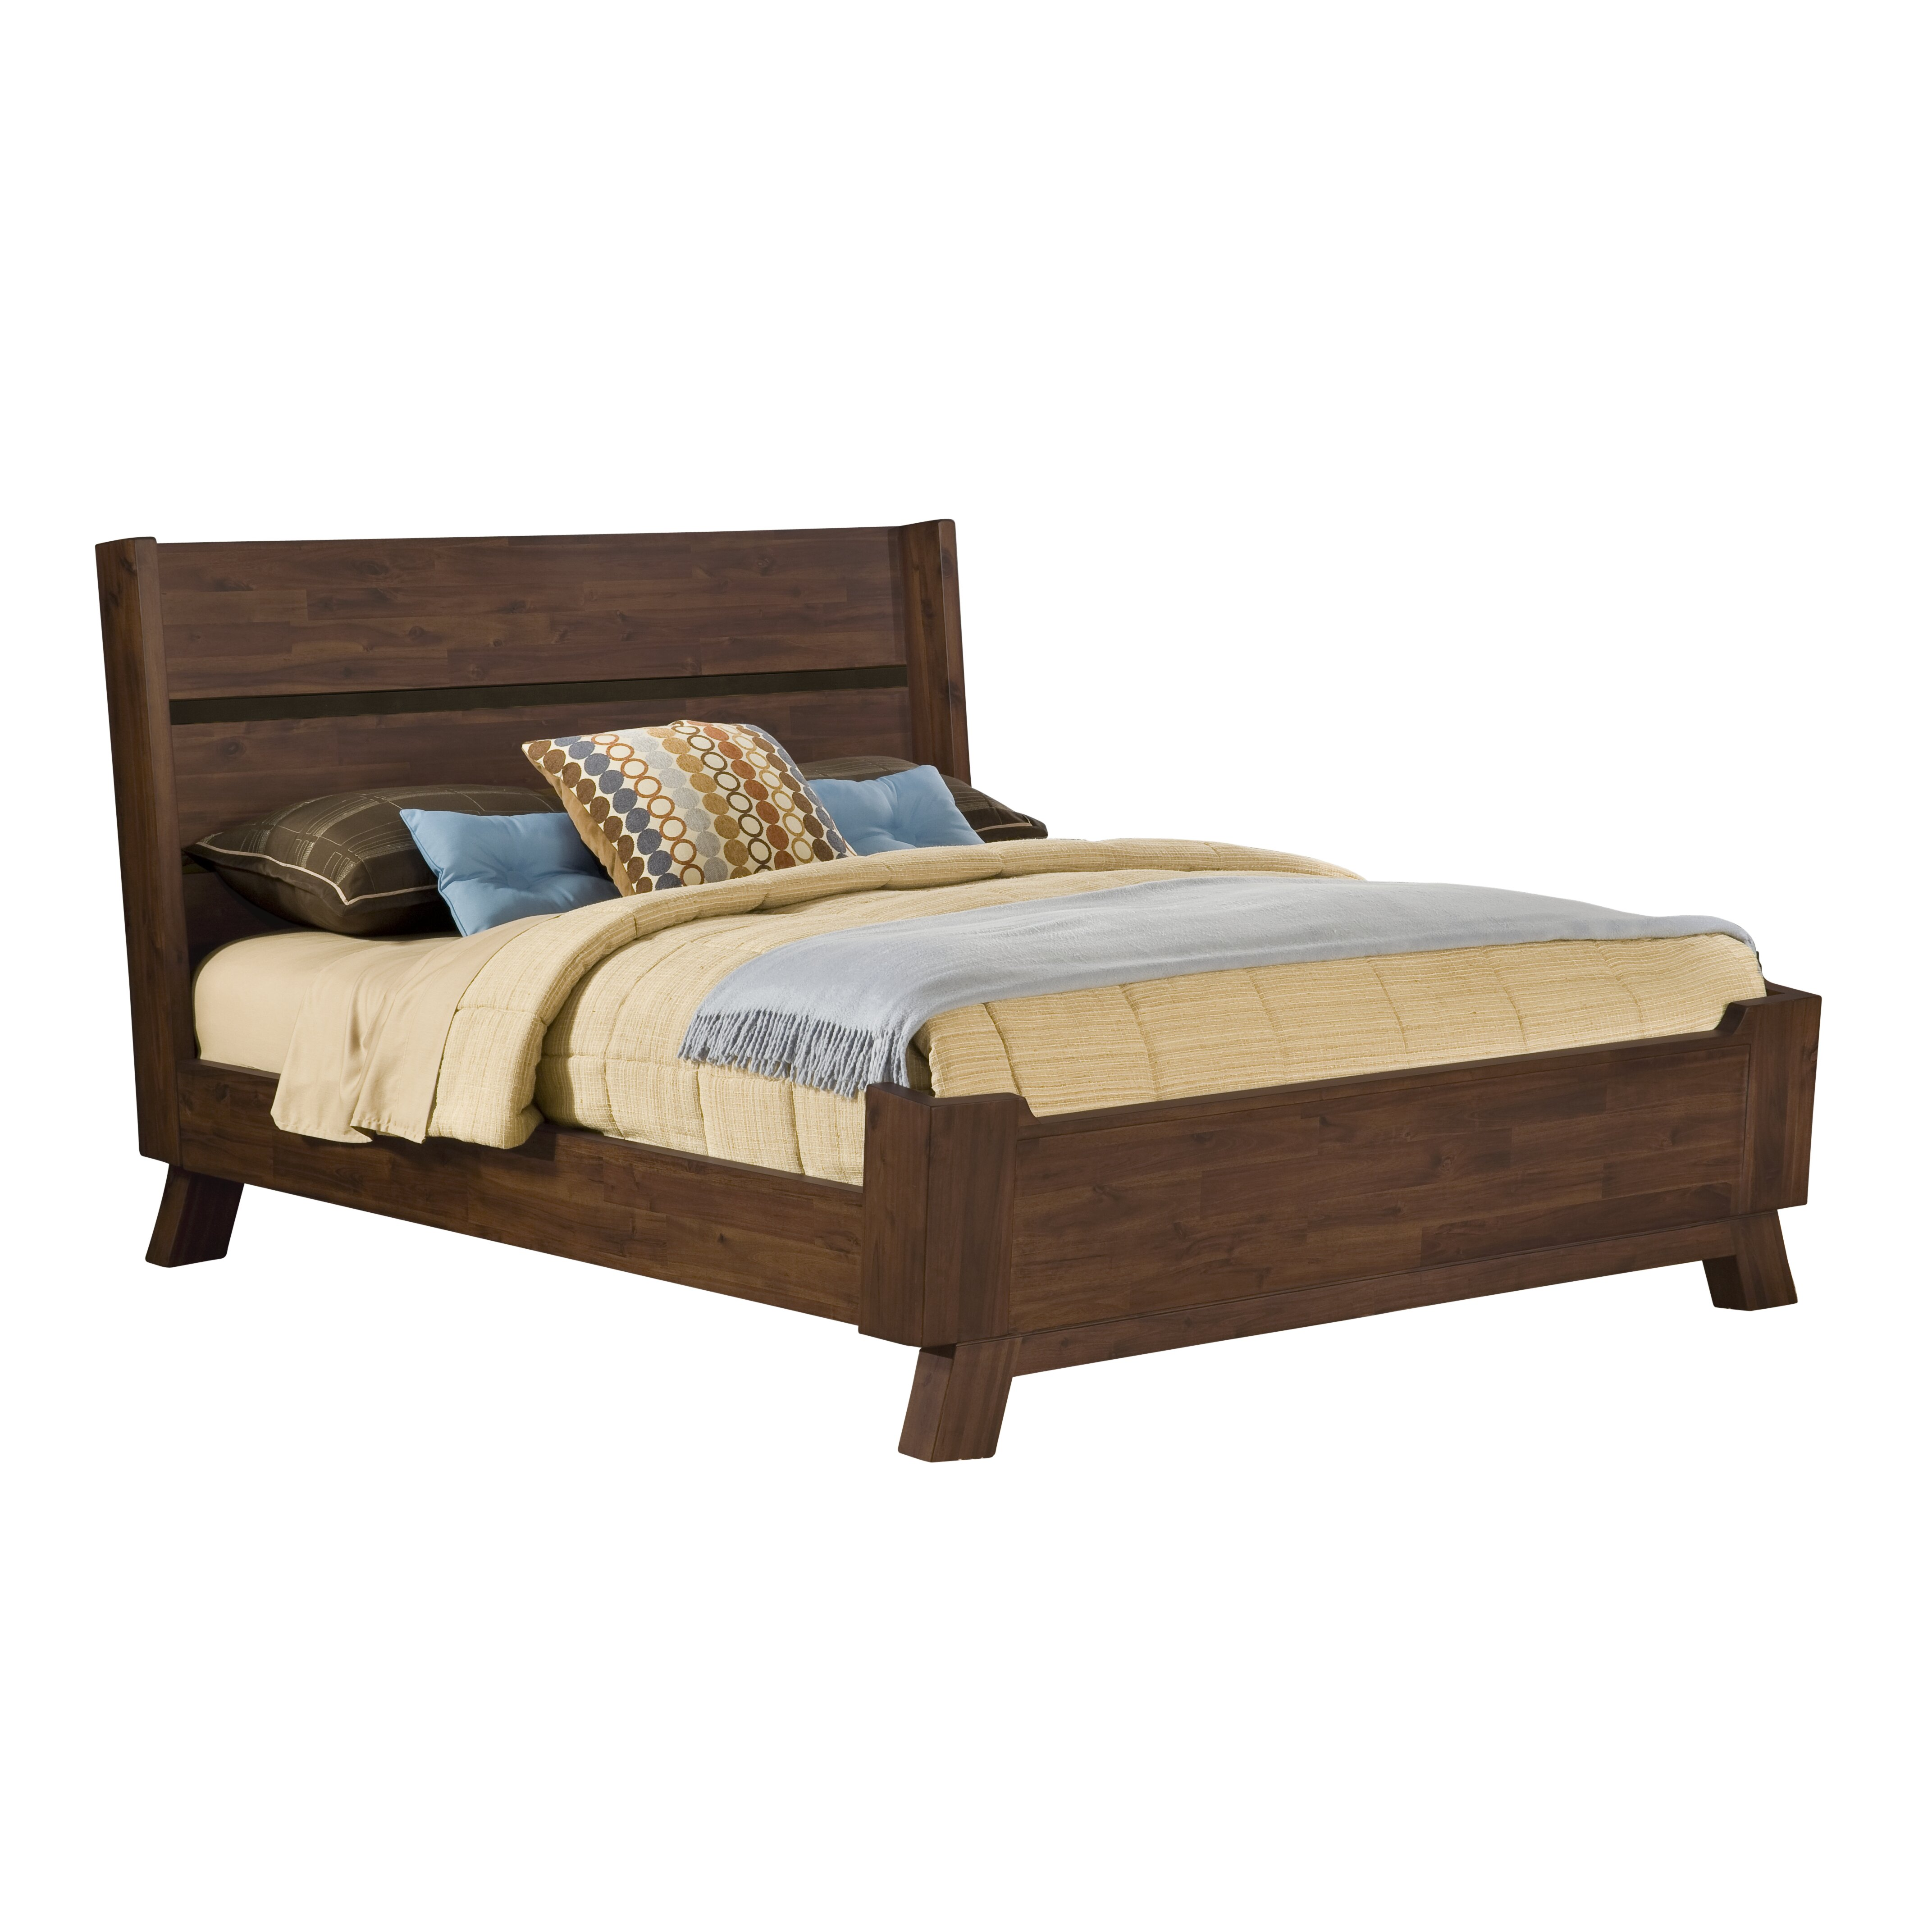 Modus Bed Reviews